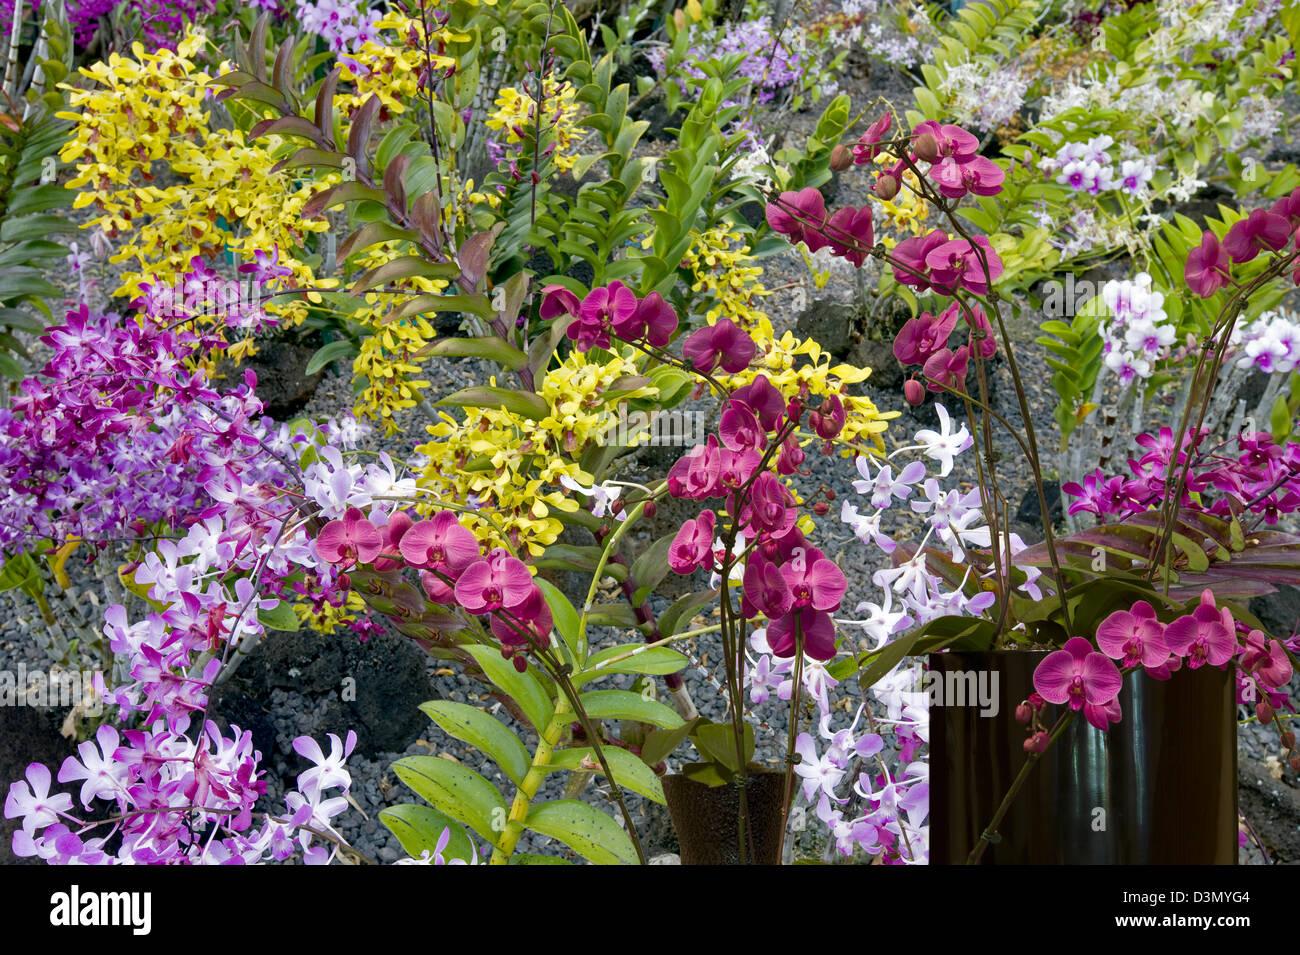 Orchideen bei Moir Gardens. Klahuna Plantation Resort. Kauai, Hawaii Stockbild